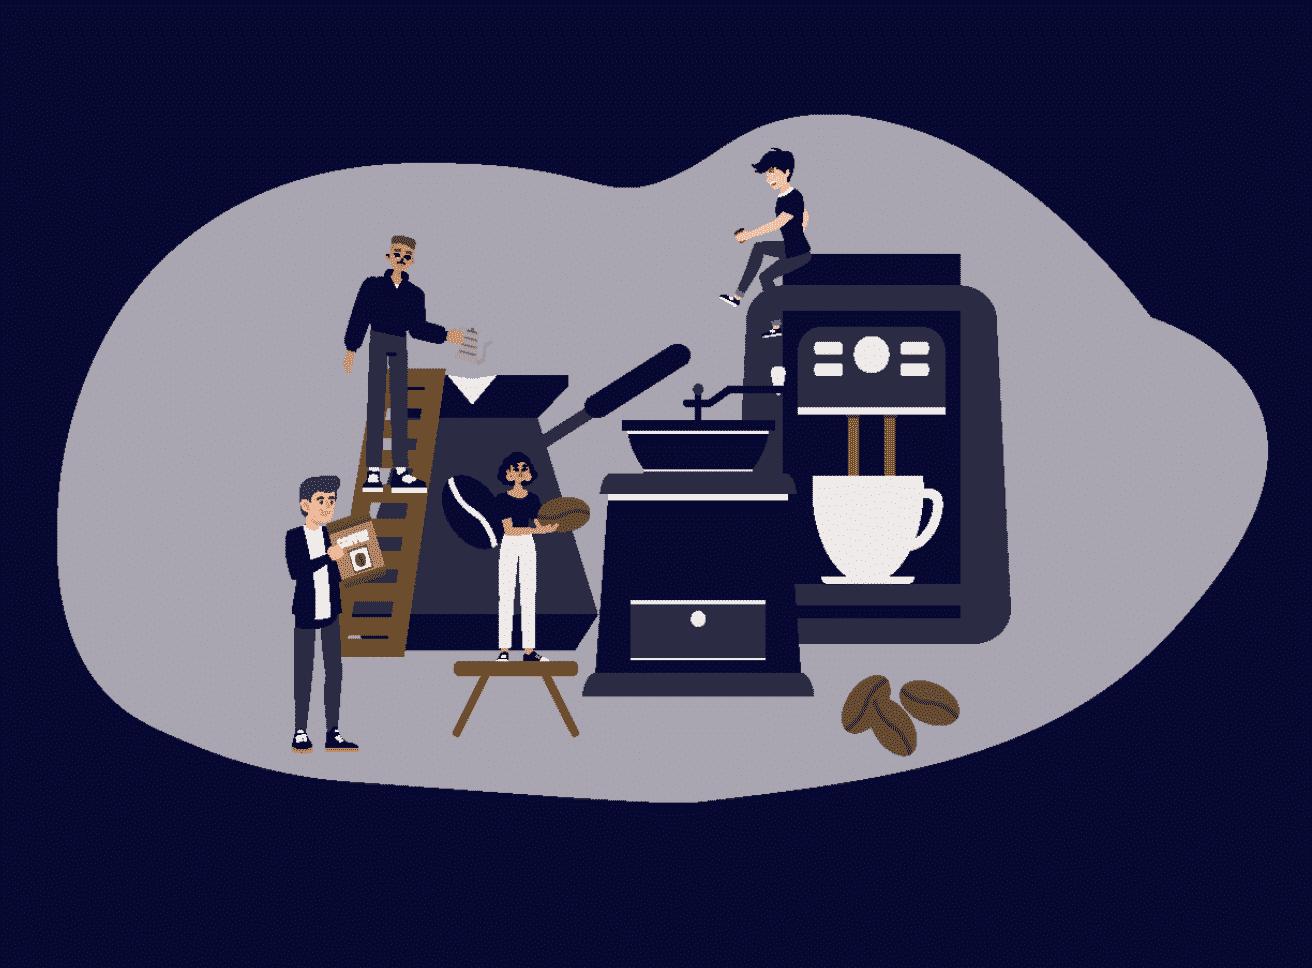 Alternative to Coffee Machines